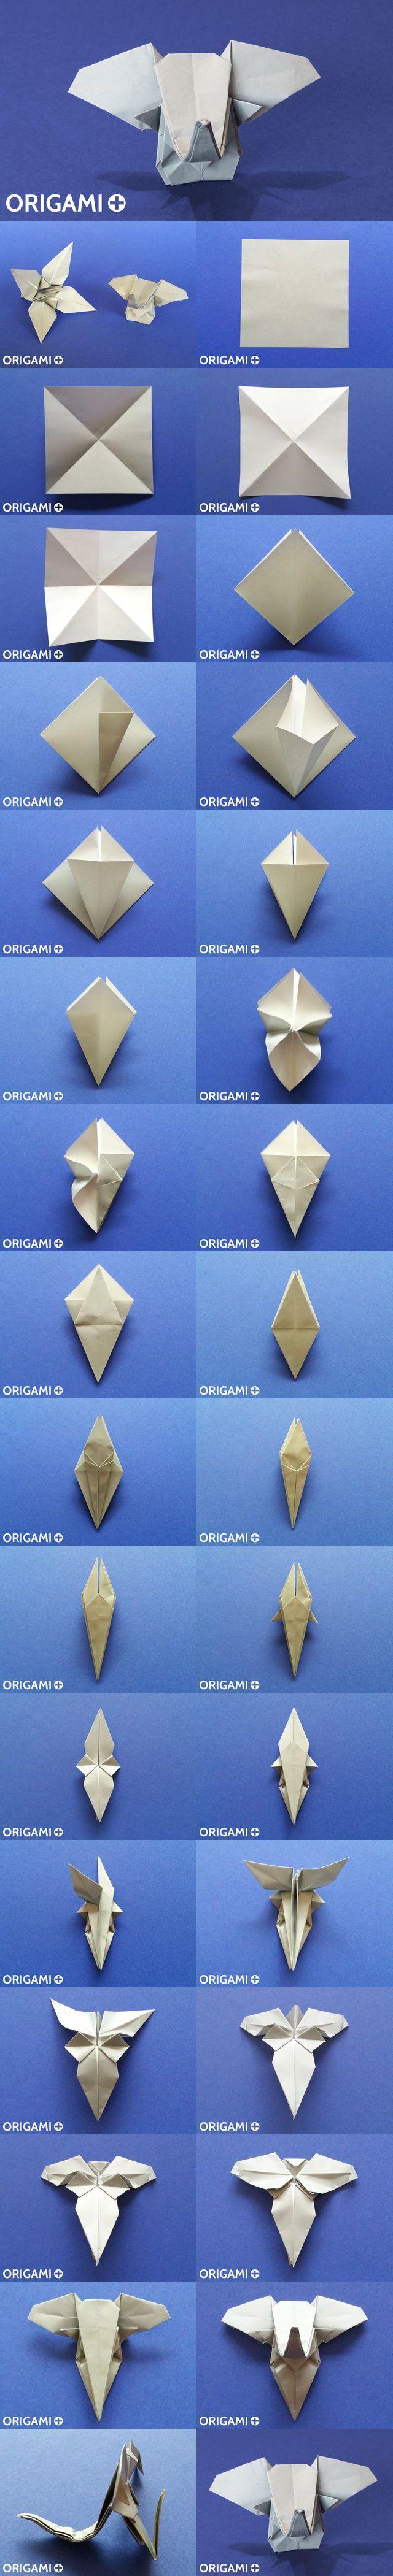 Origami Elephant head diagram + DIY video tutorial.